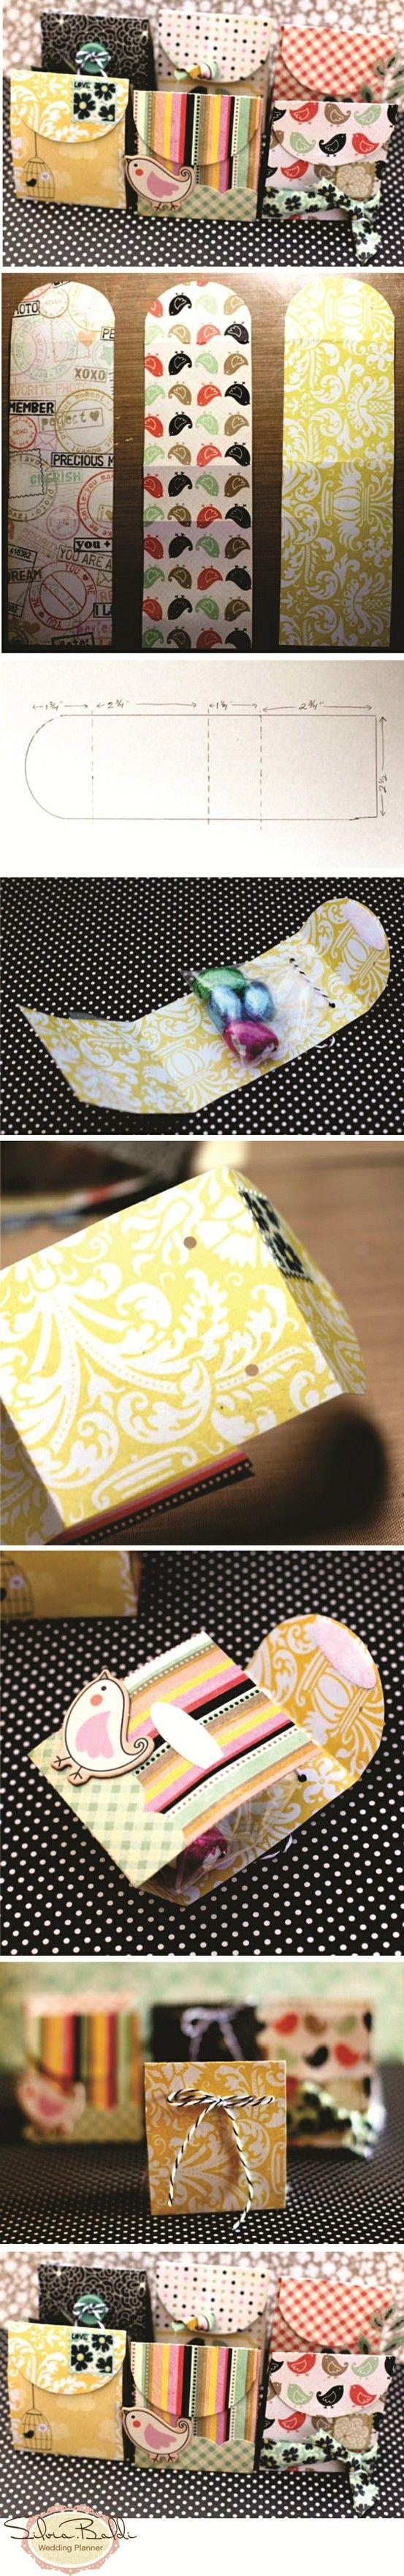 easy to make DIY gift boxes | origami | Pinterest | Box, DIY wedding ...